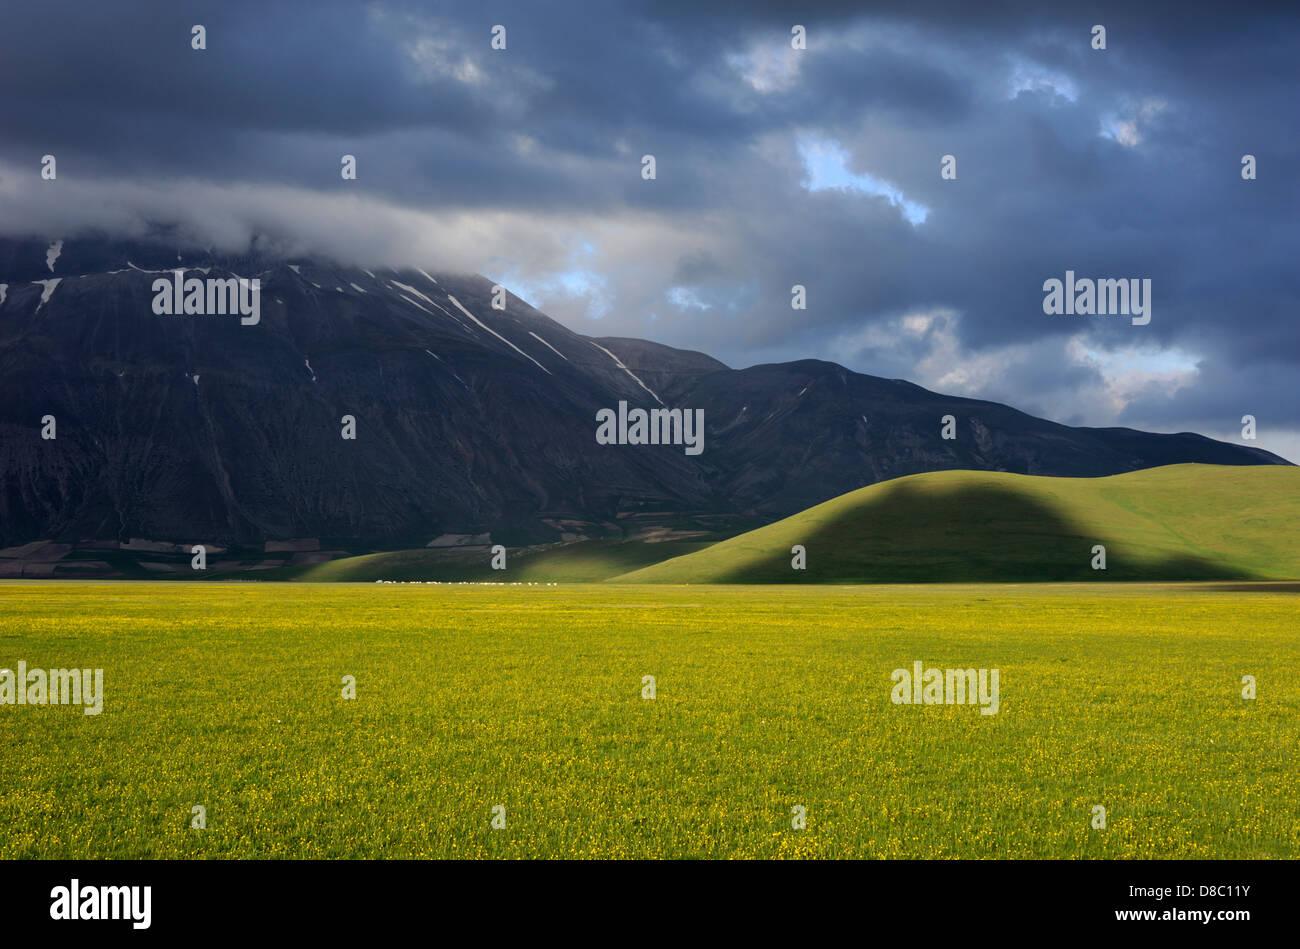 italy, umbria, sibillini national park, piano grande and monte vettore - Stock Image